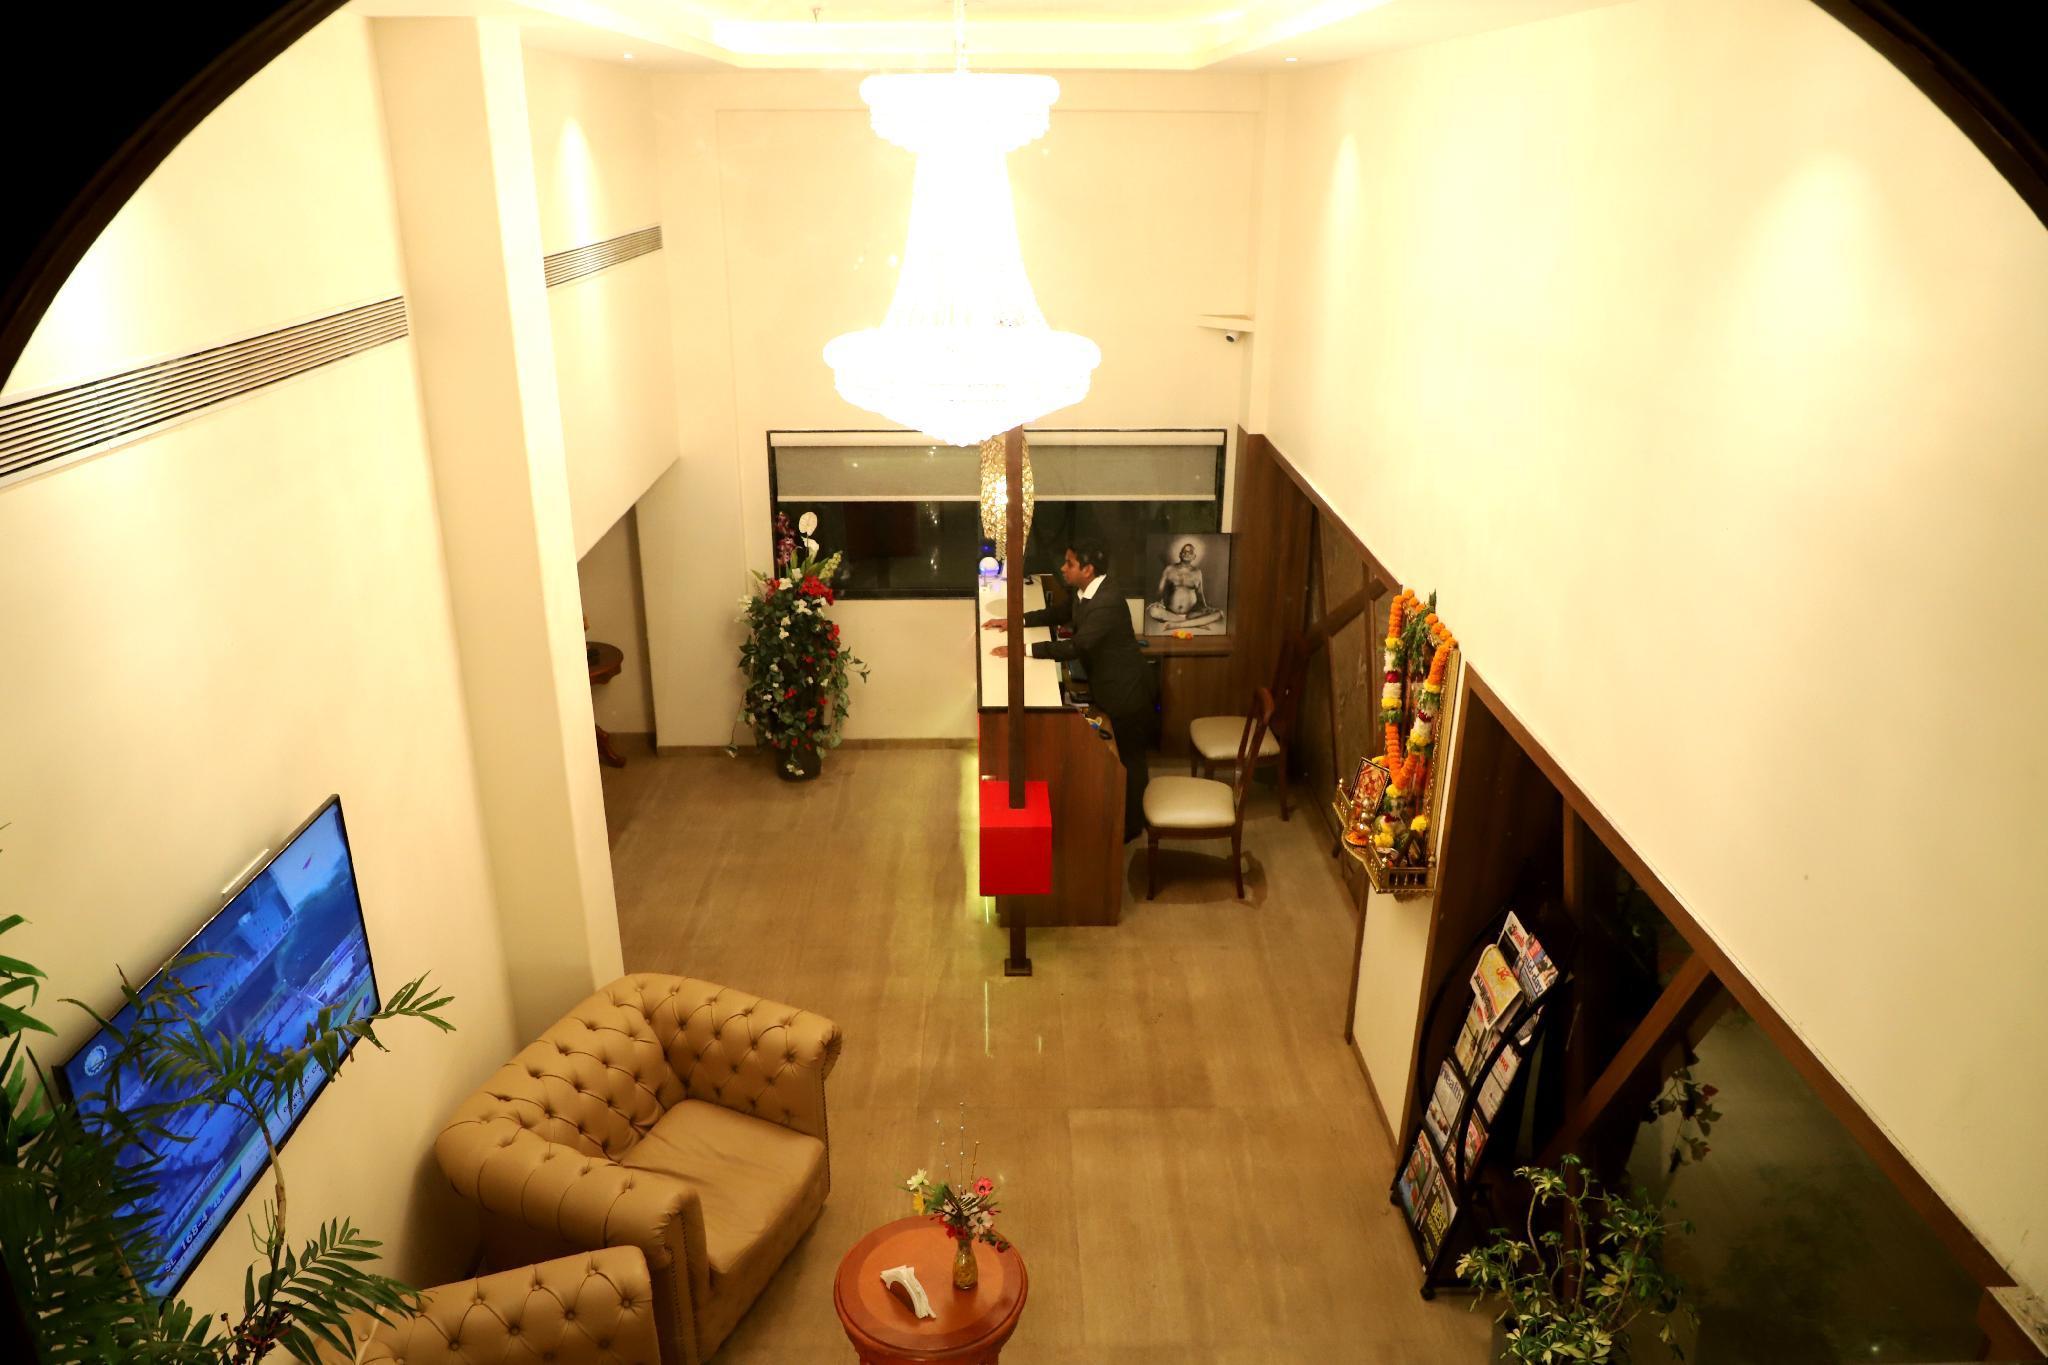 Hotel Reyansh Grand, Palghar